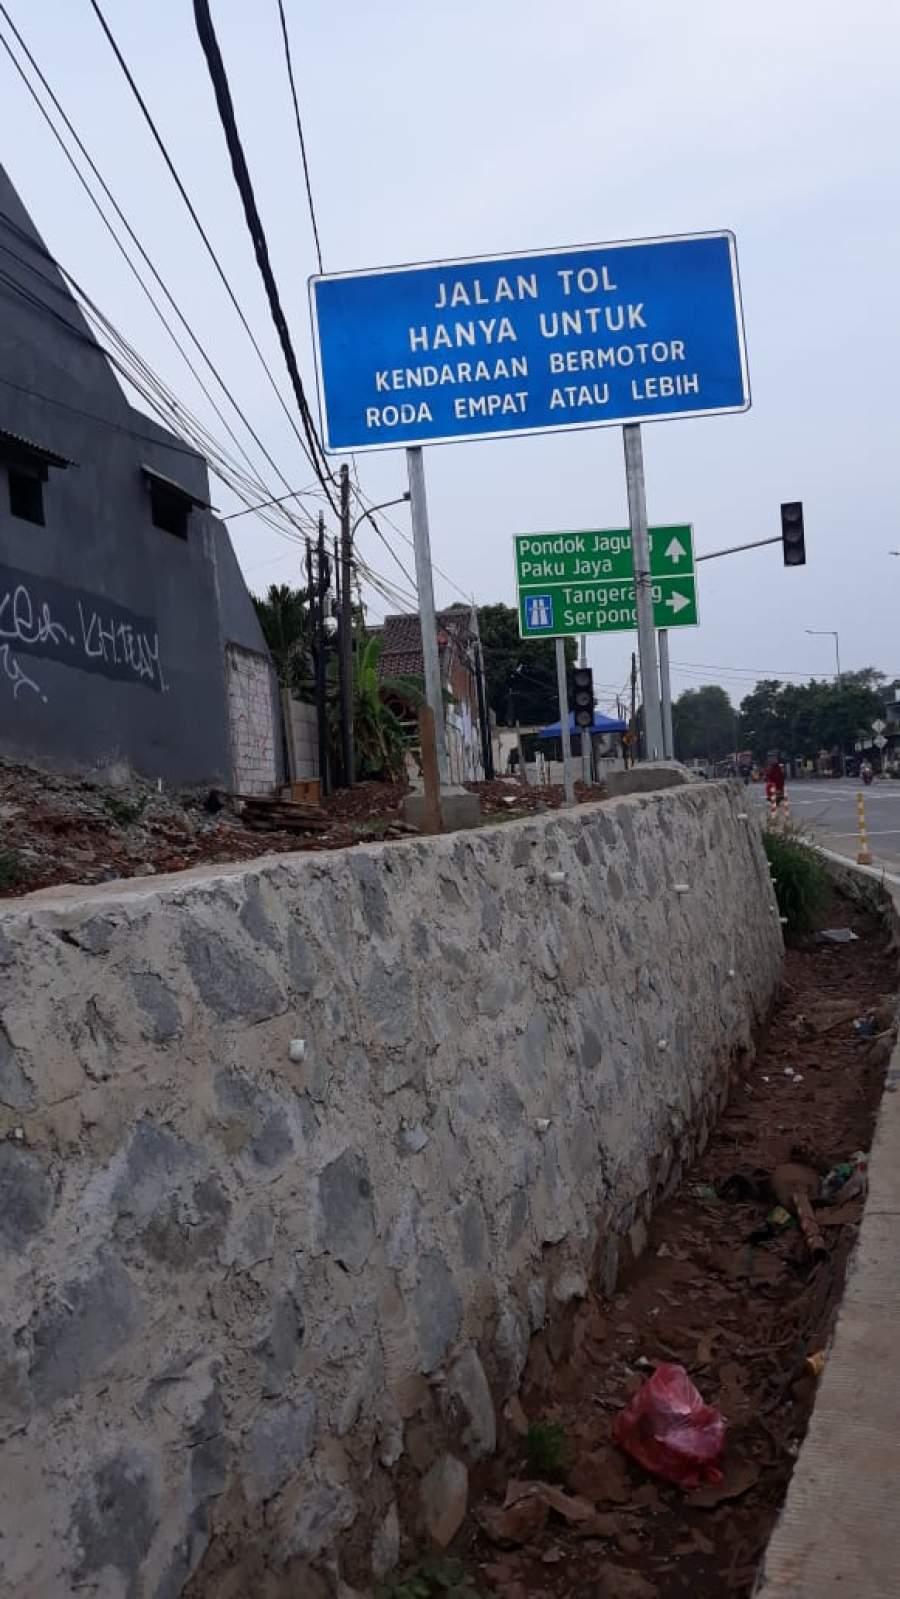 Tampak tembok warga dibelakang jal tol kunciran serpong tanpa tembok pembatas